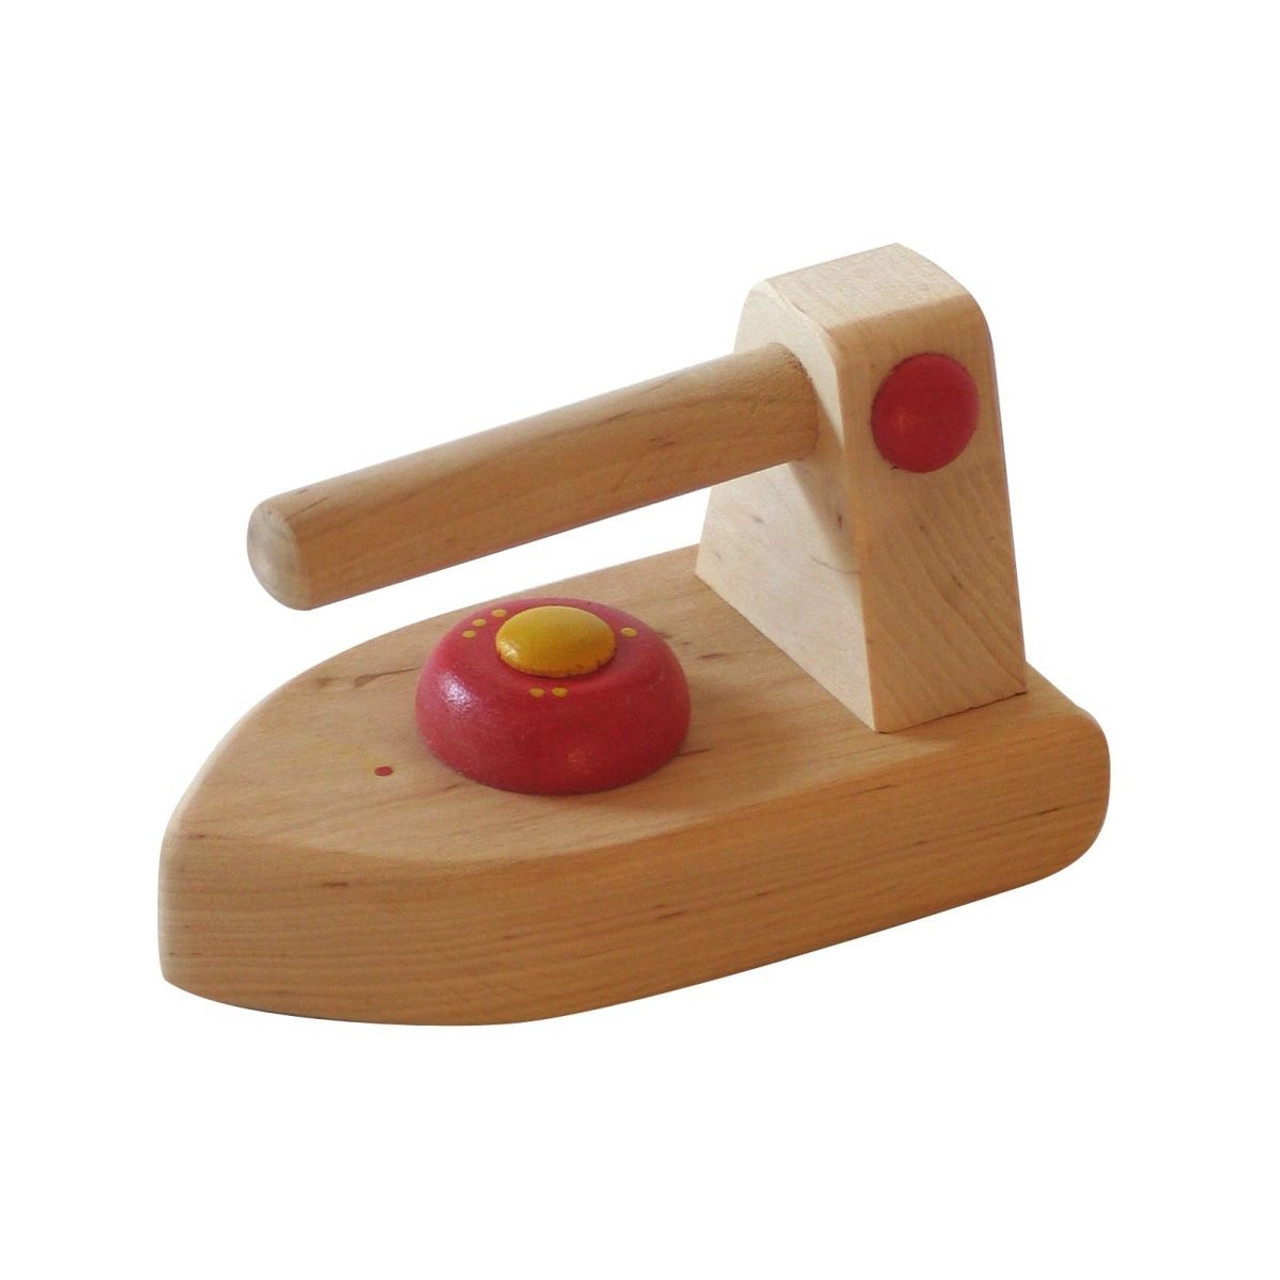 Wooden Iron Toy